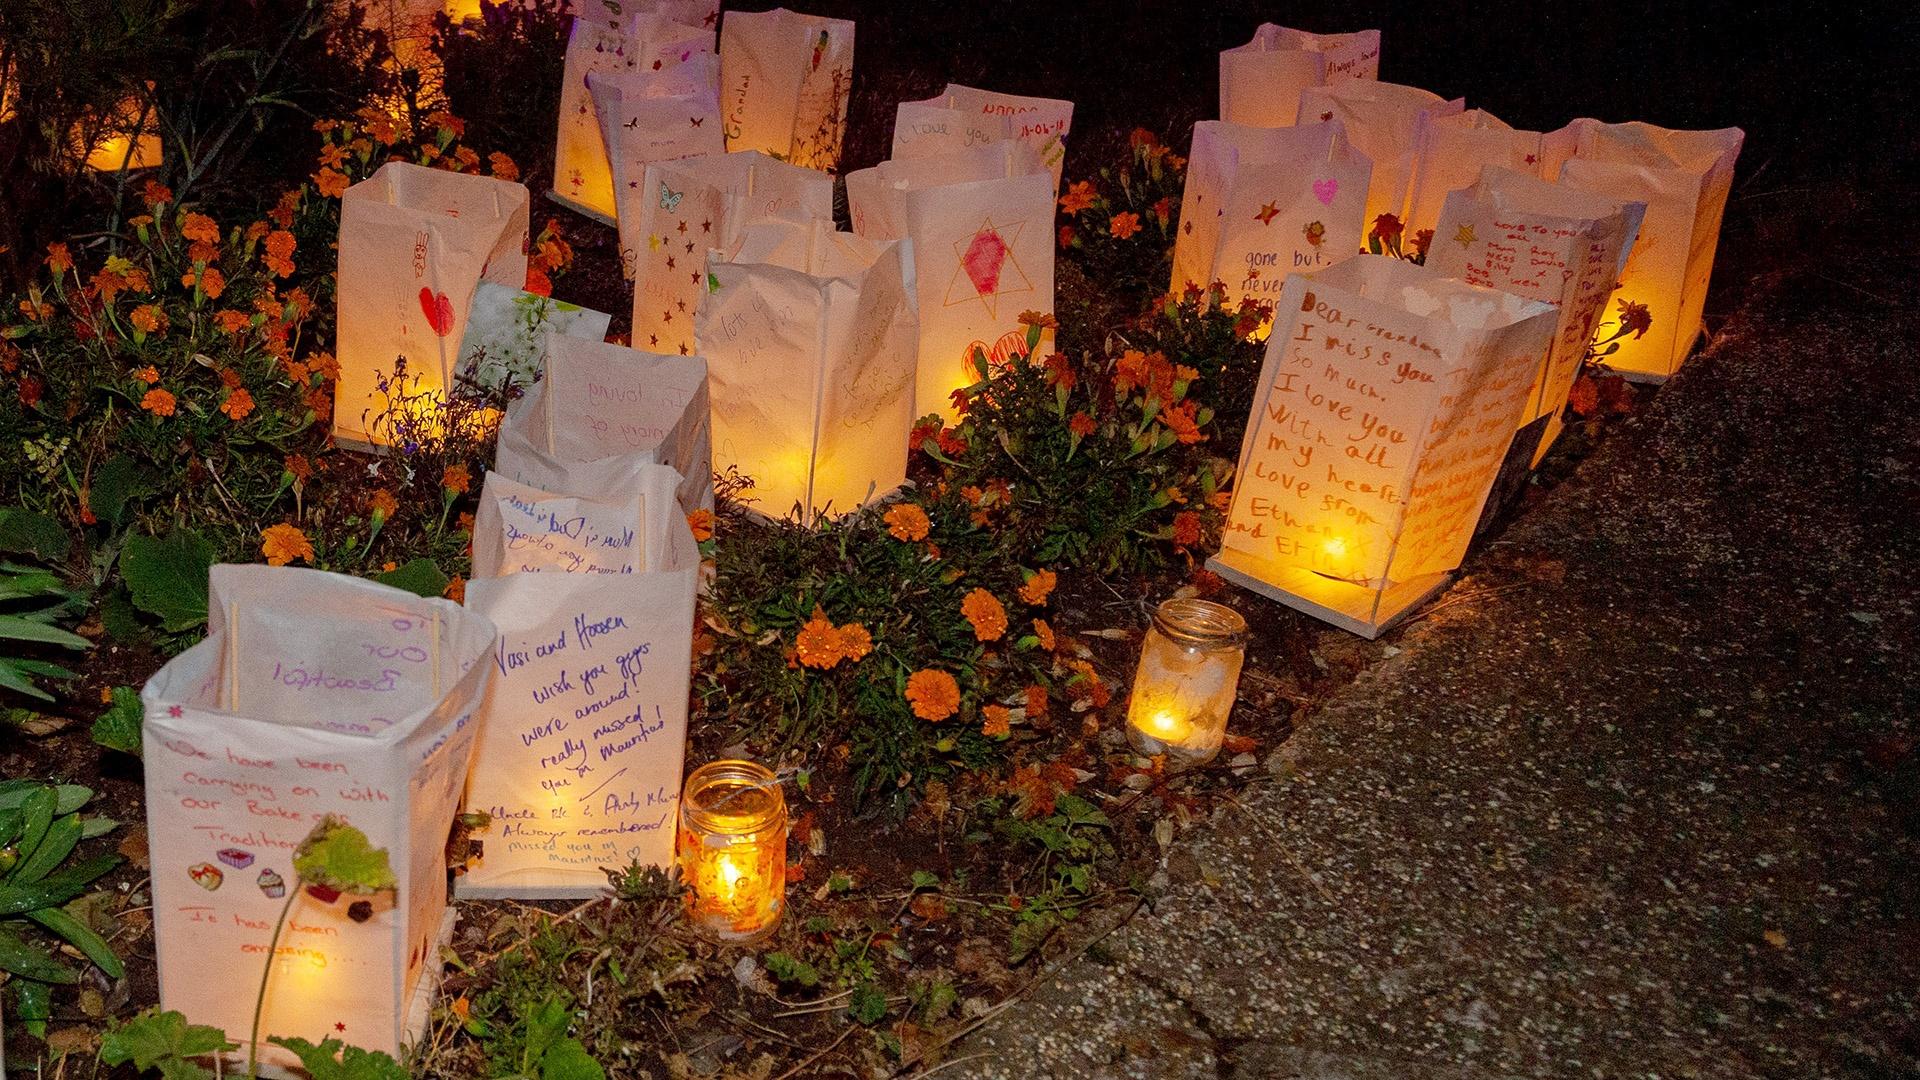 Willen Hospice Twilight Lantern Week Top Image